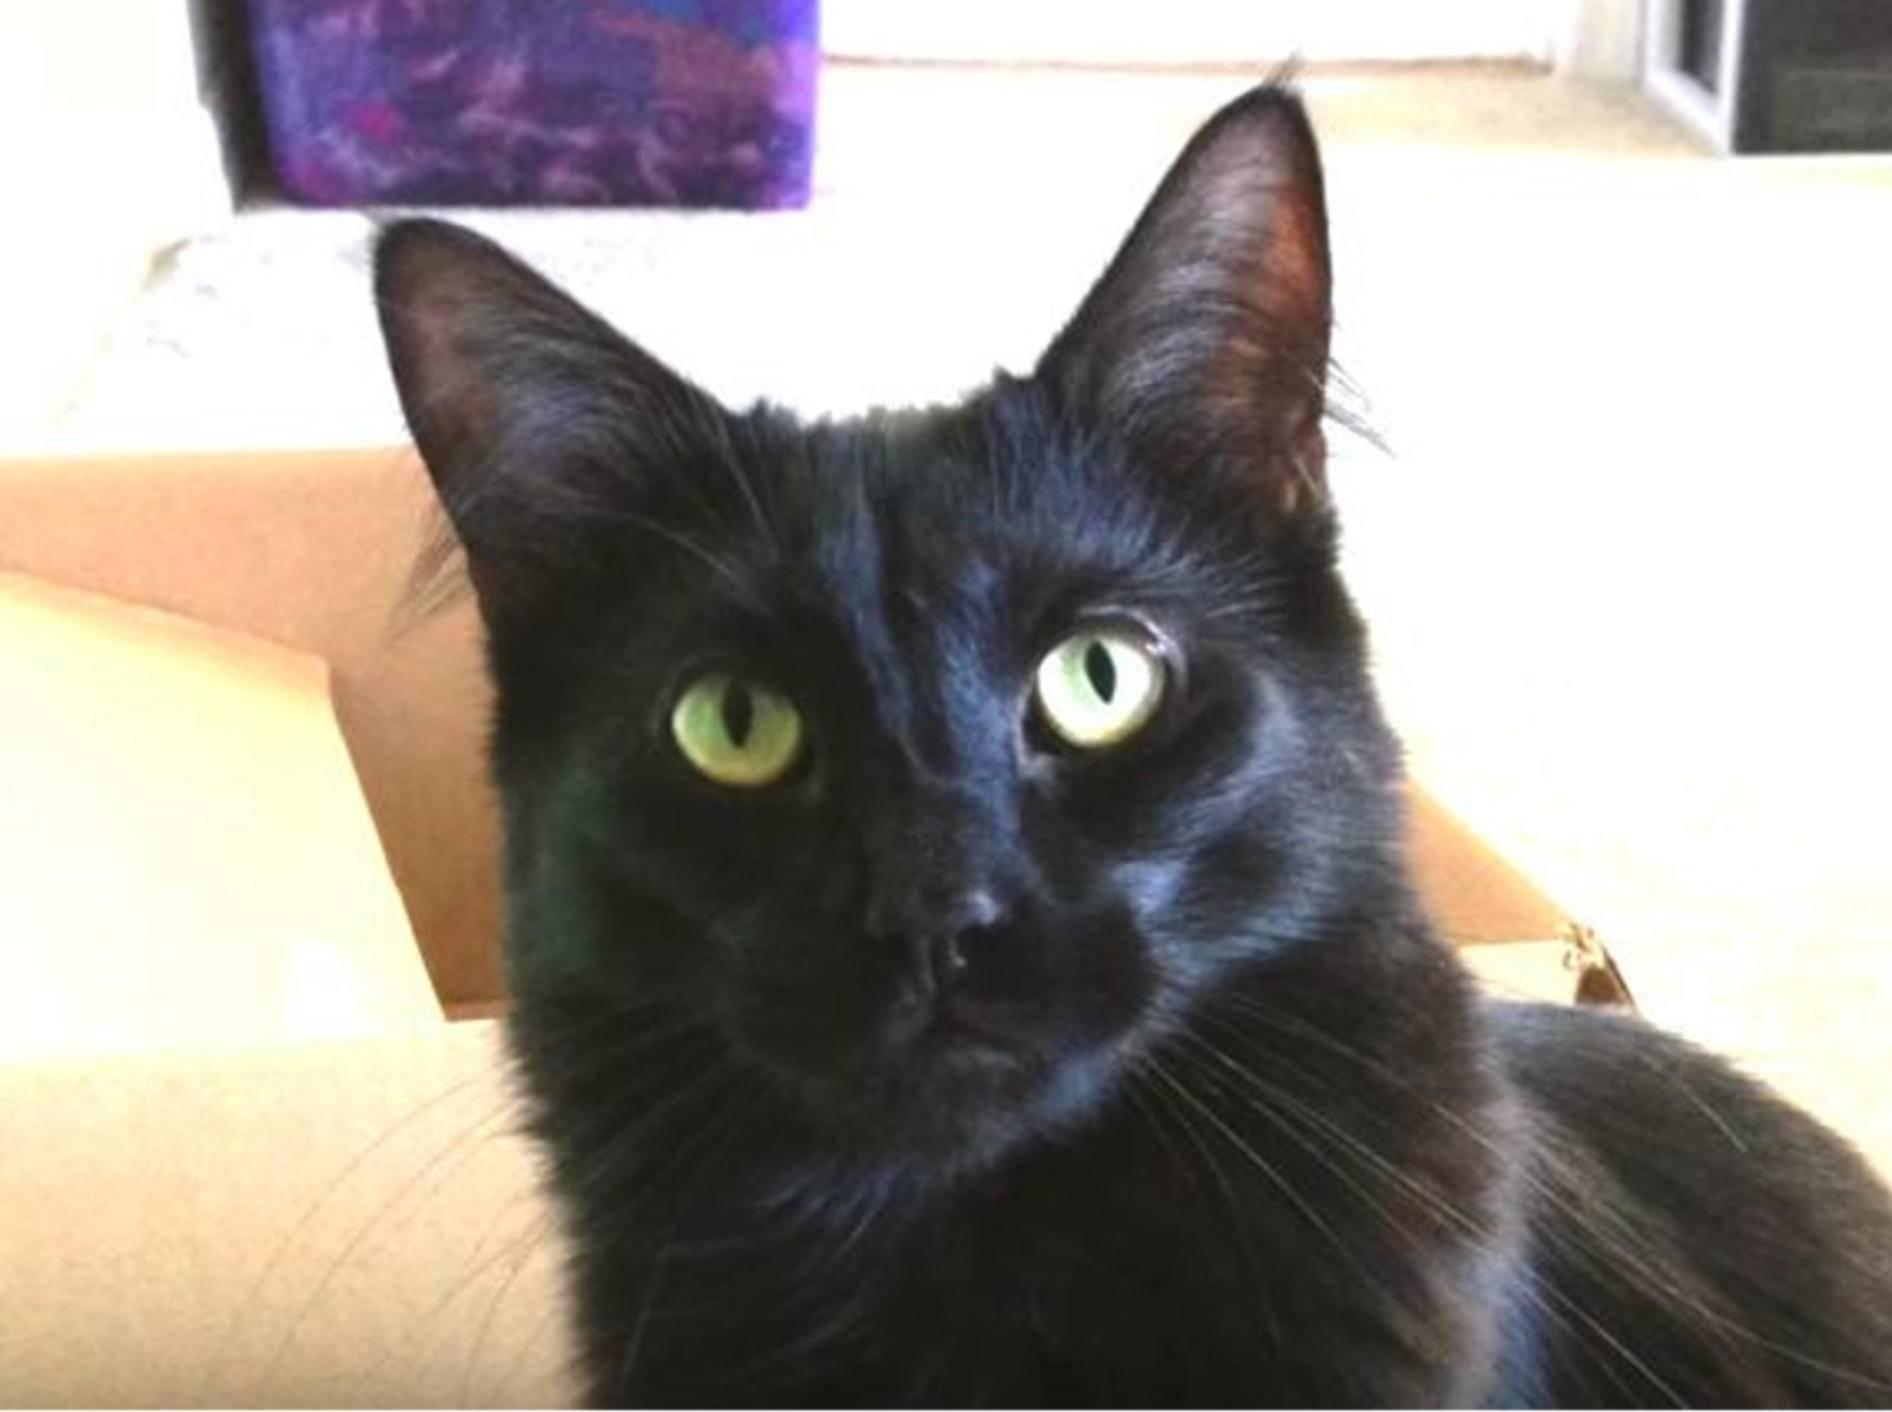 Schwarze Katzen bringen Unglück? Von wegen! – YouTube / Cole and Marmalade